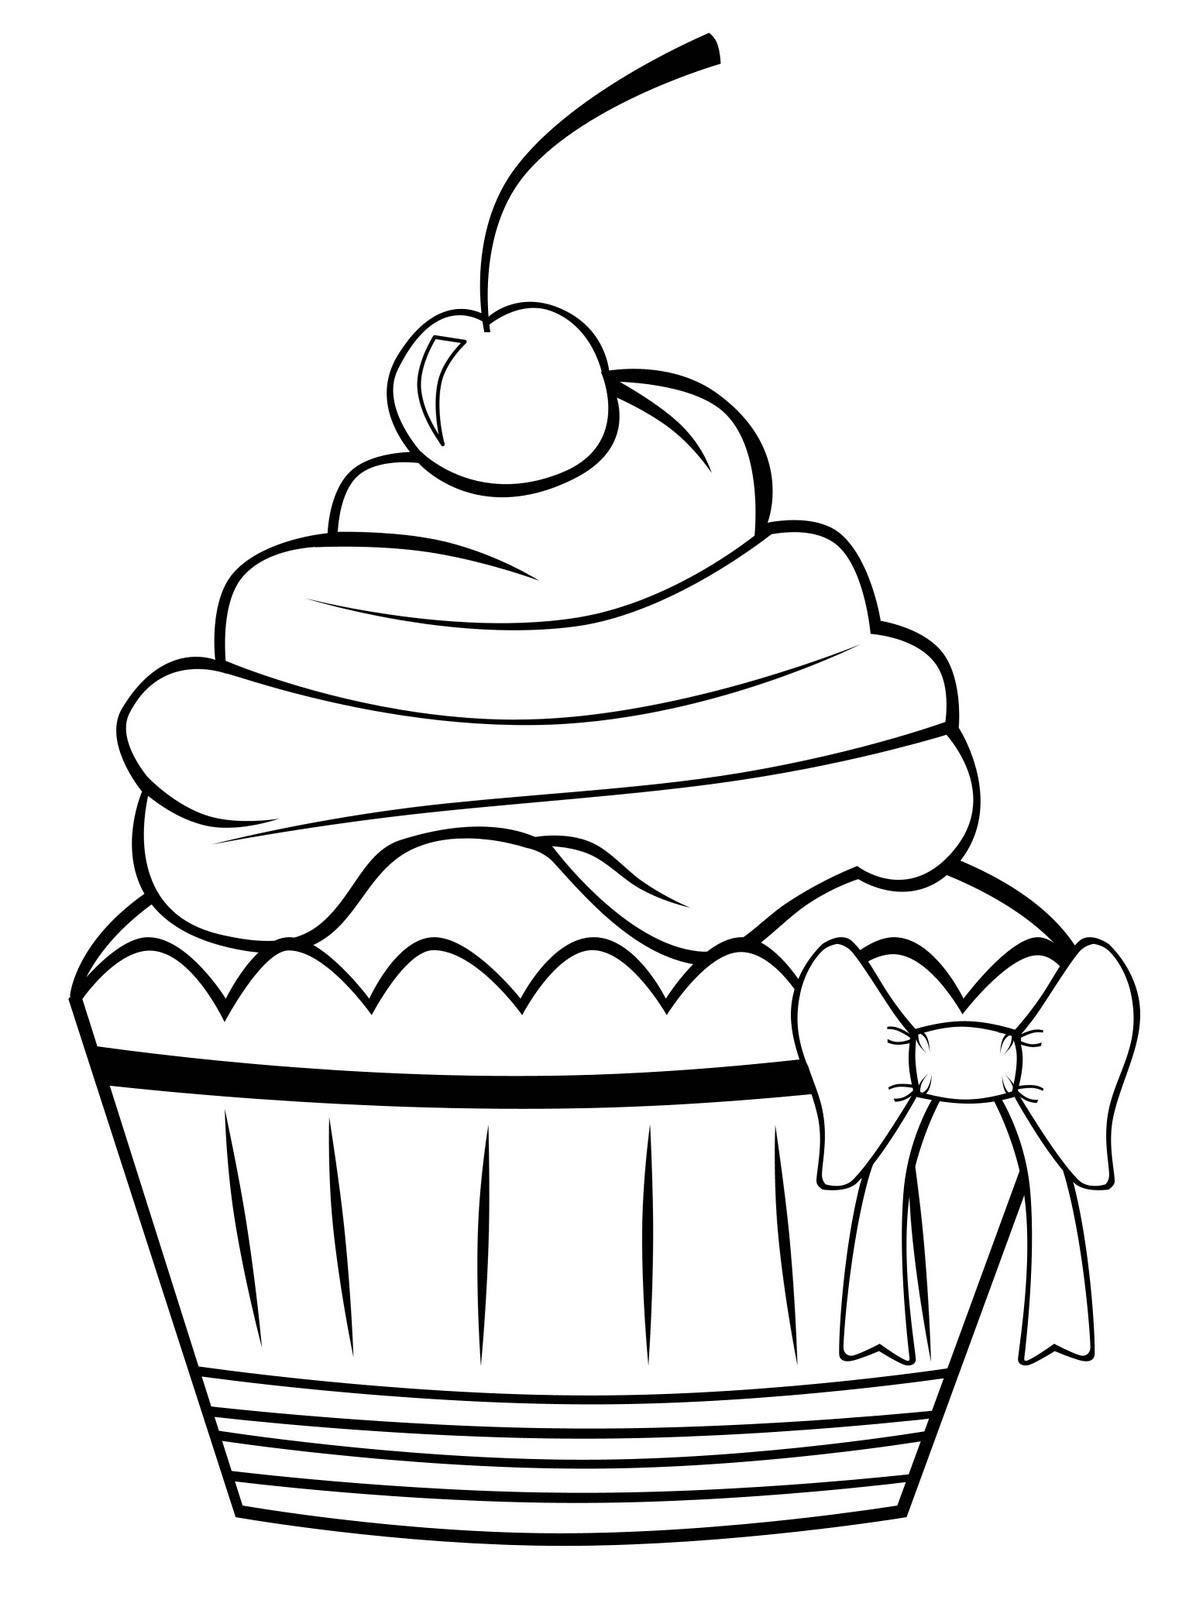 18 Coloring Page Cupcake Cupcake Coloring Pages Cute Coloring Pages Coloring For Kids